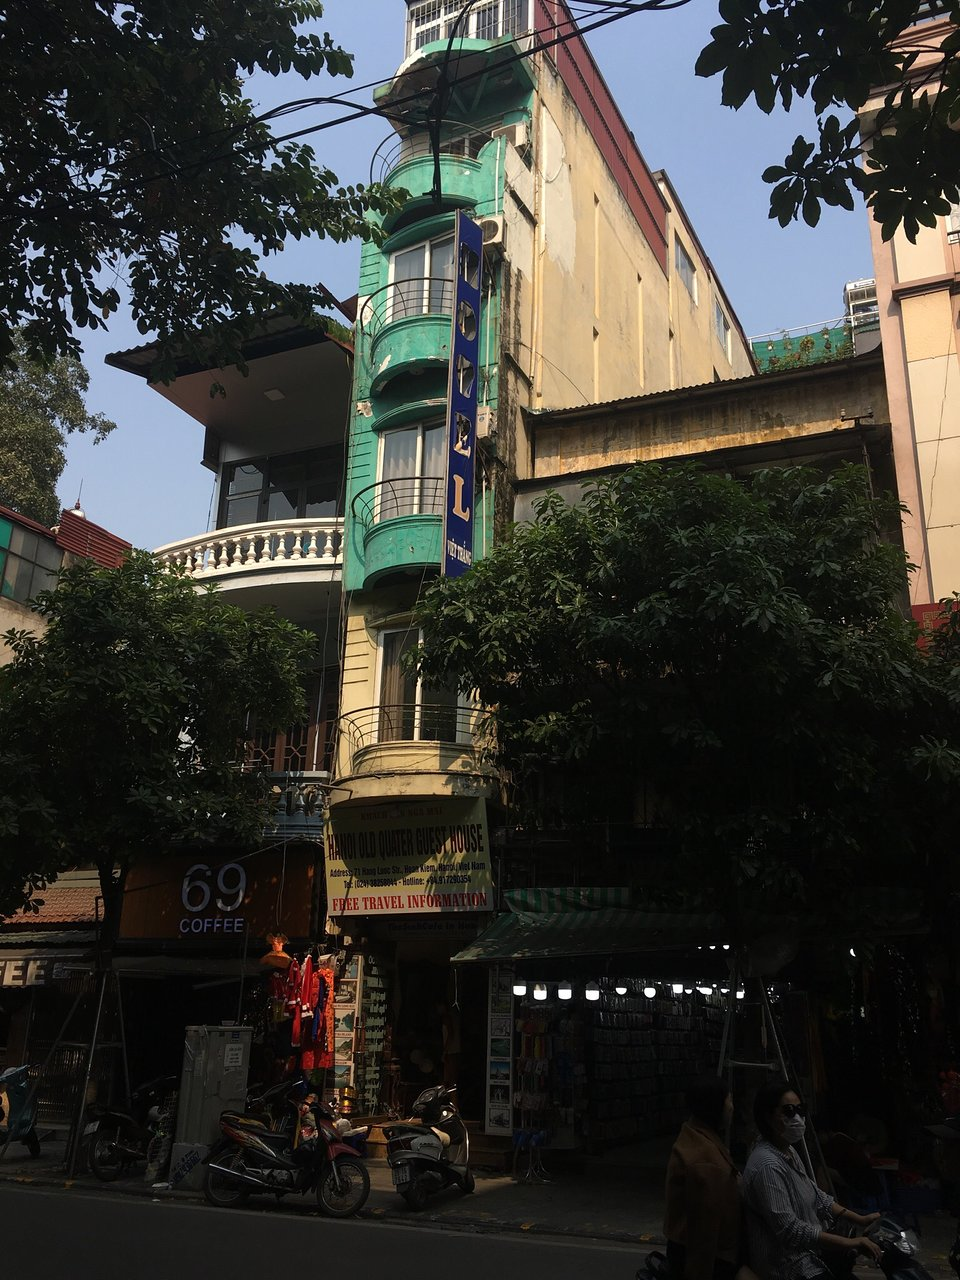 kangaroo hotel updated 2019 prices hostel reviews hanoi rh tripadvisor com